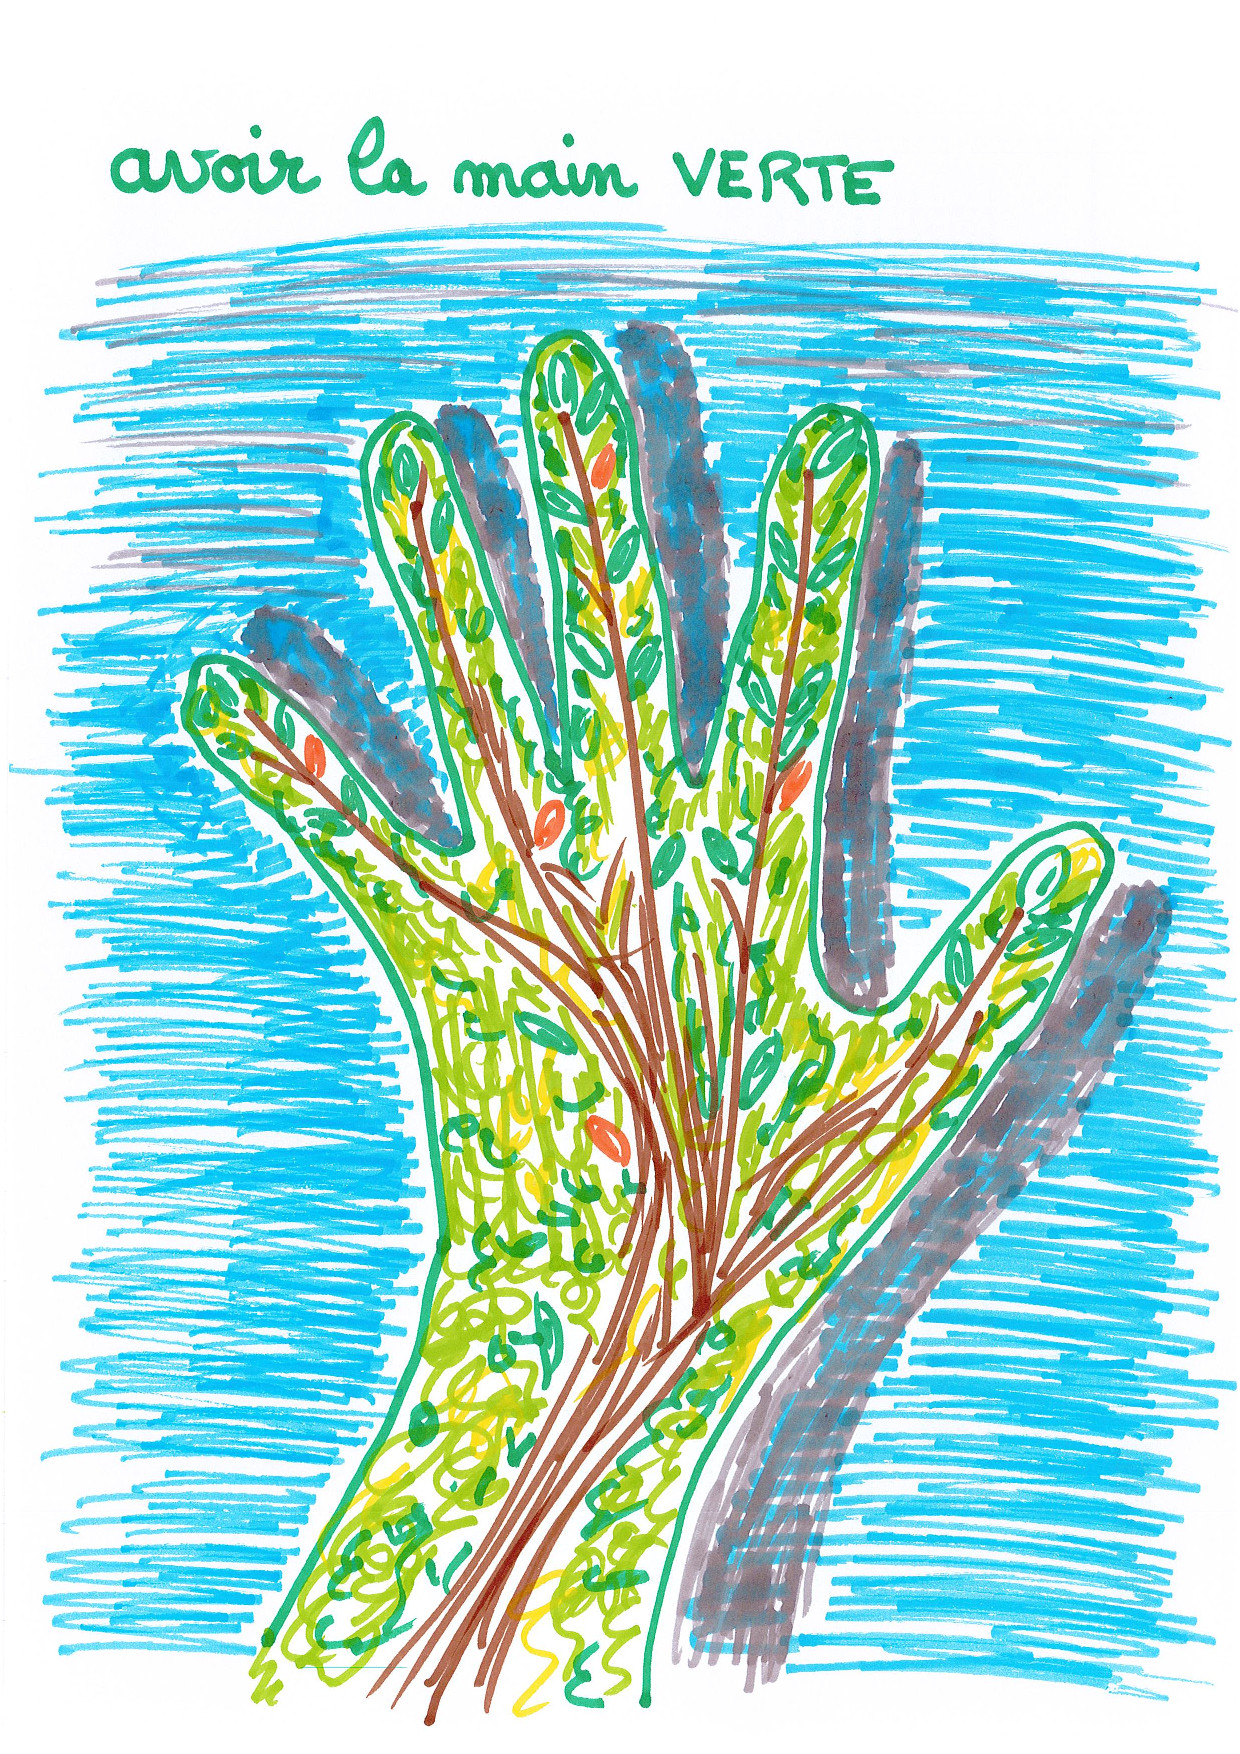 dessin main verte